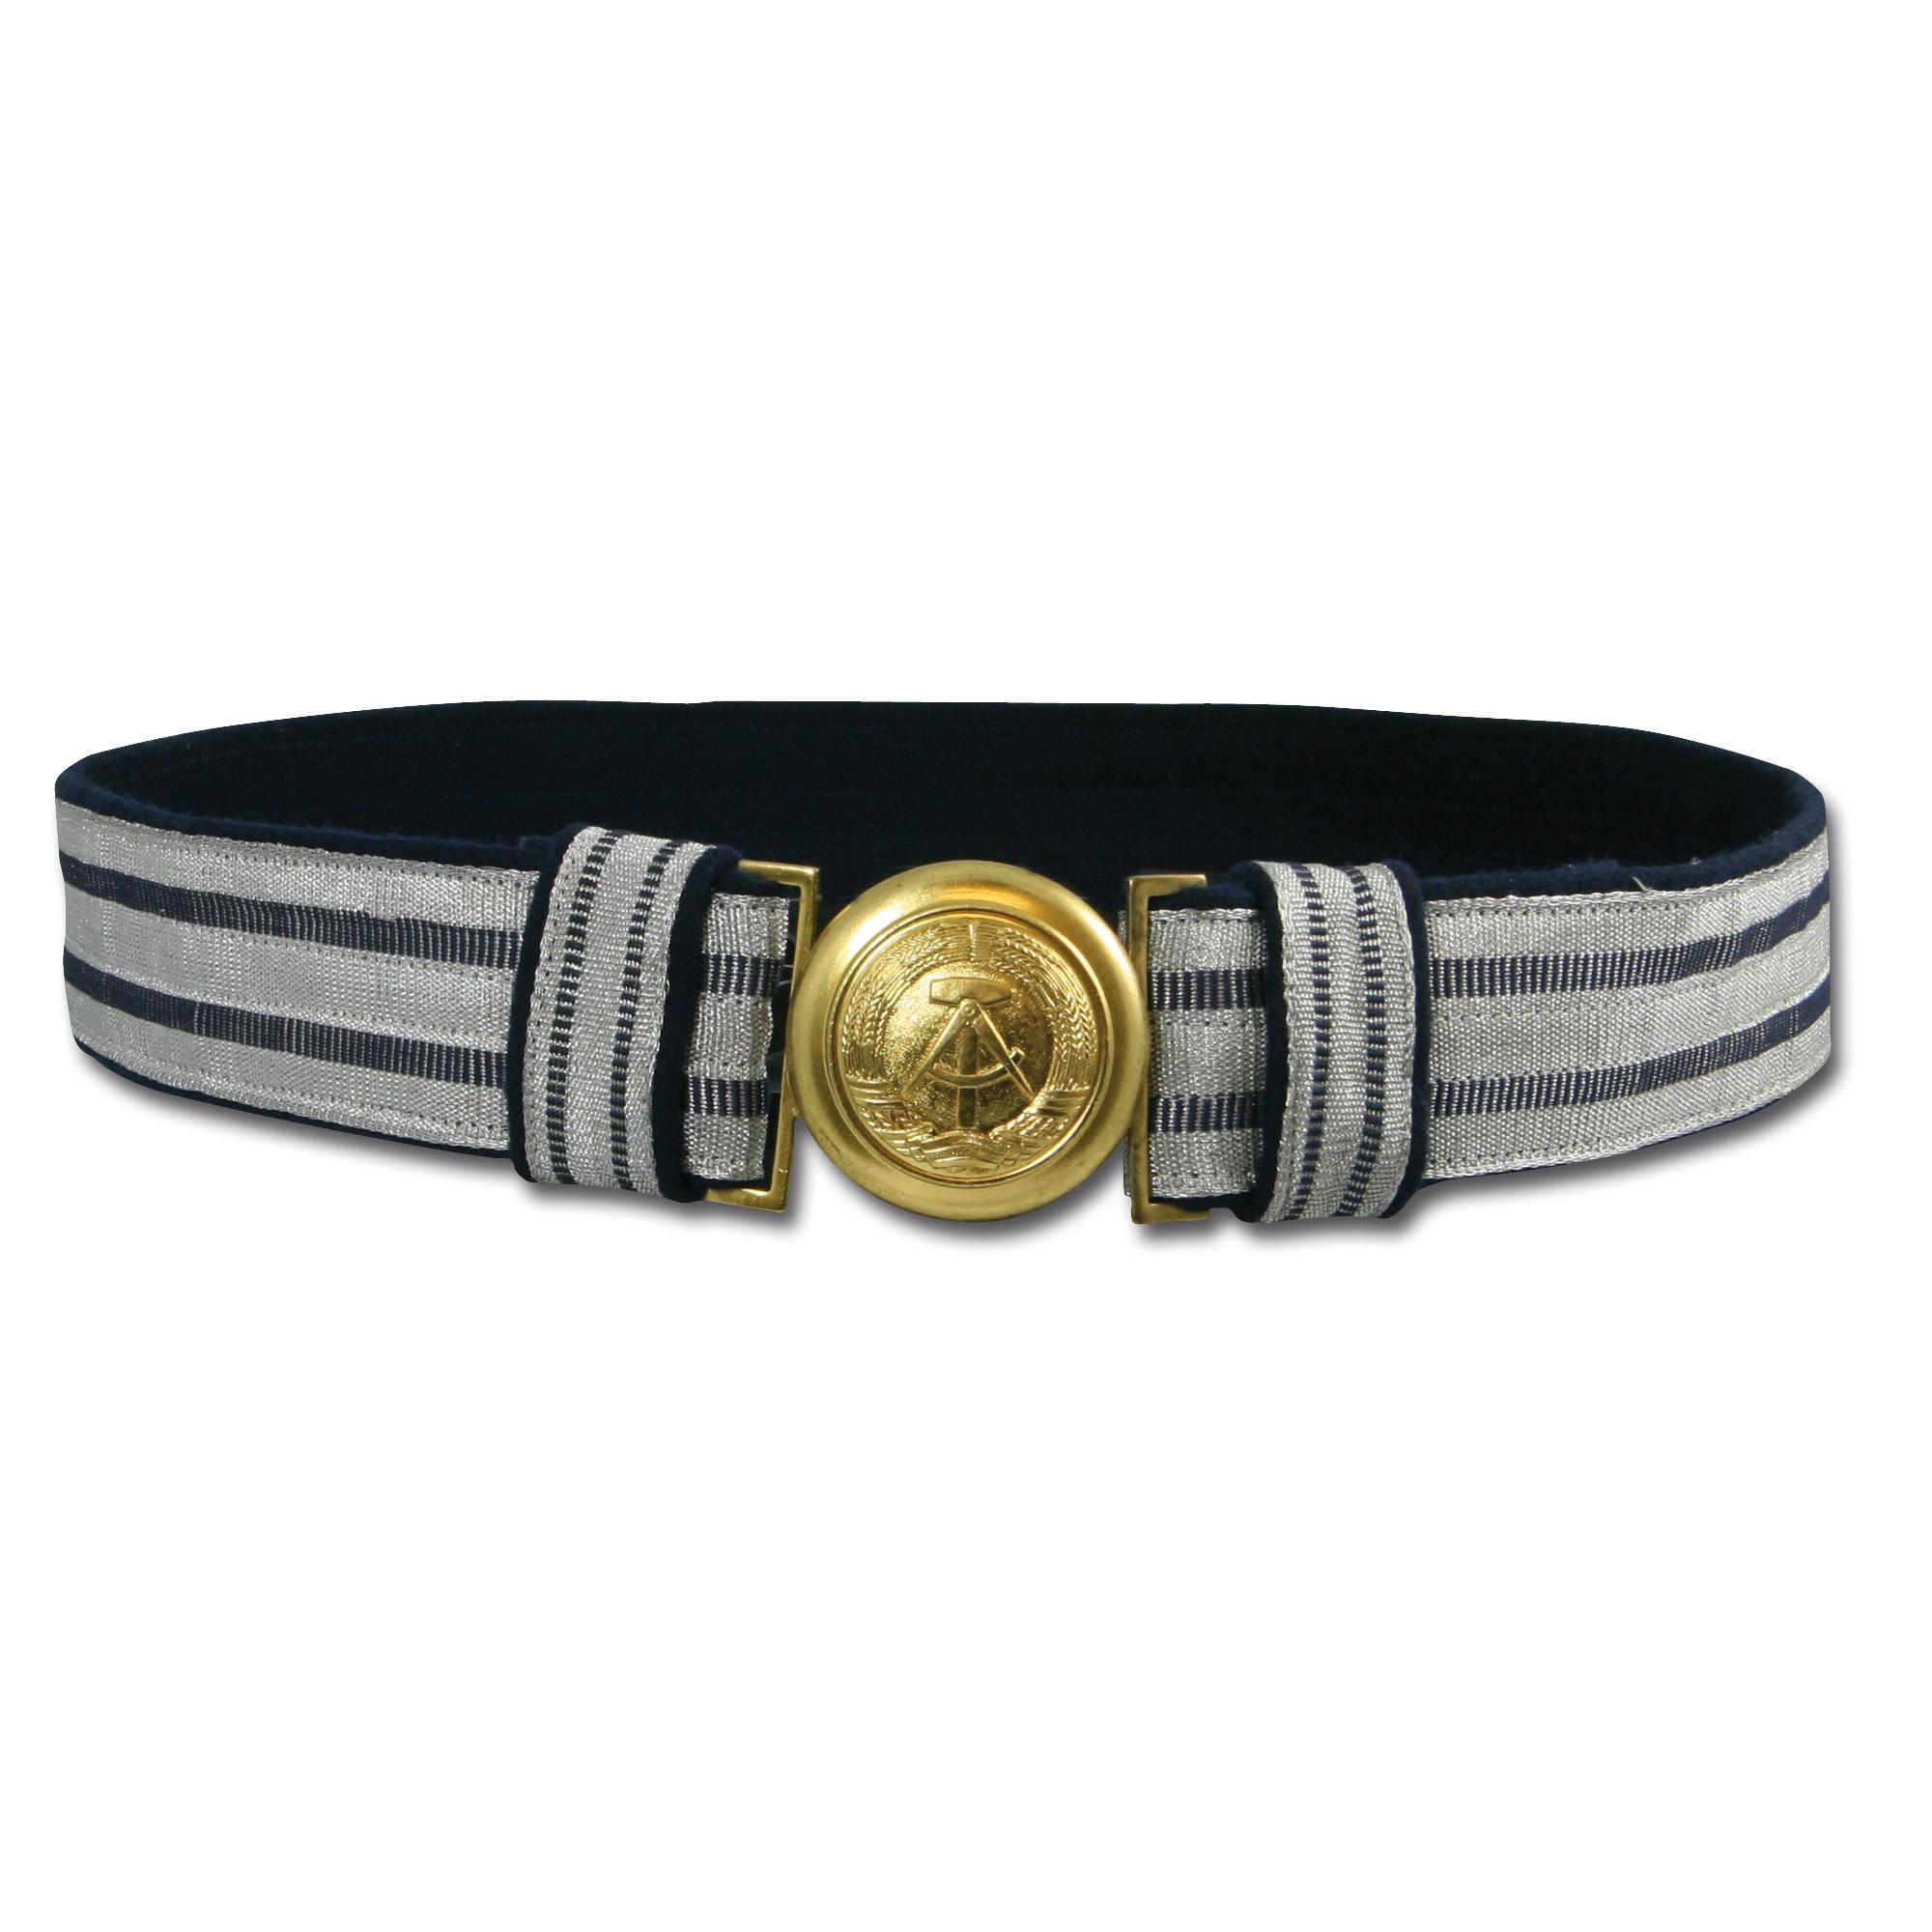 NVA Dress Belt gold